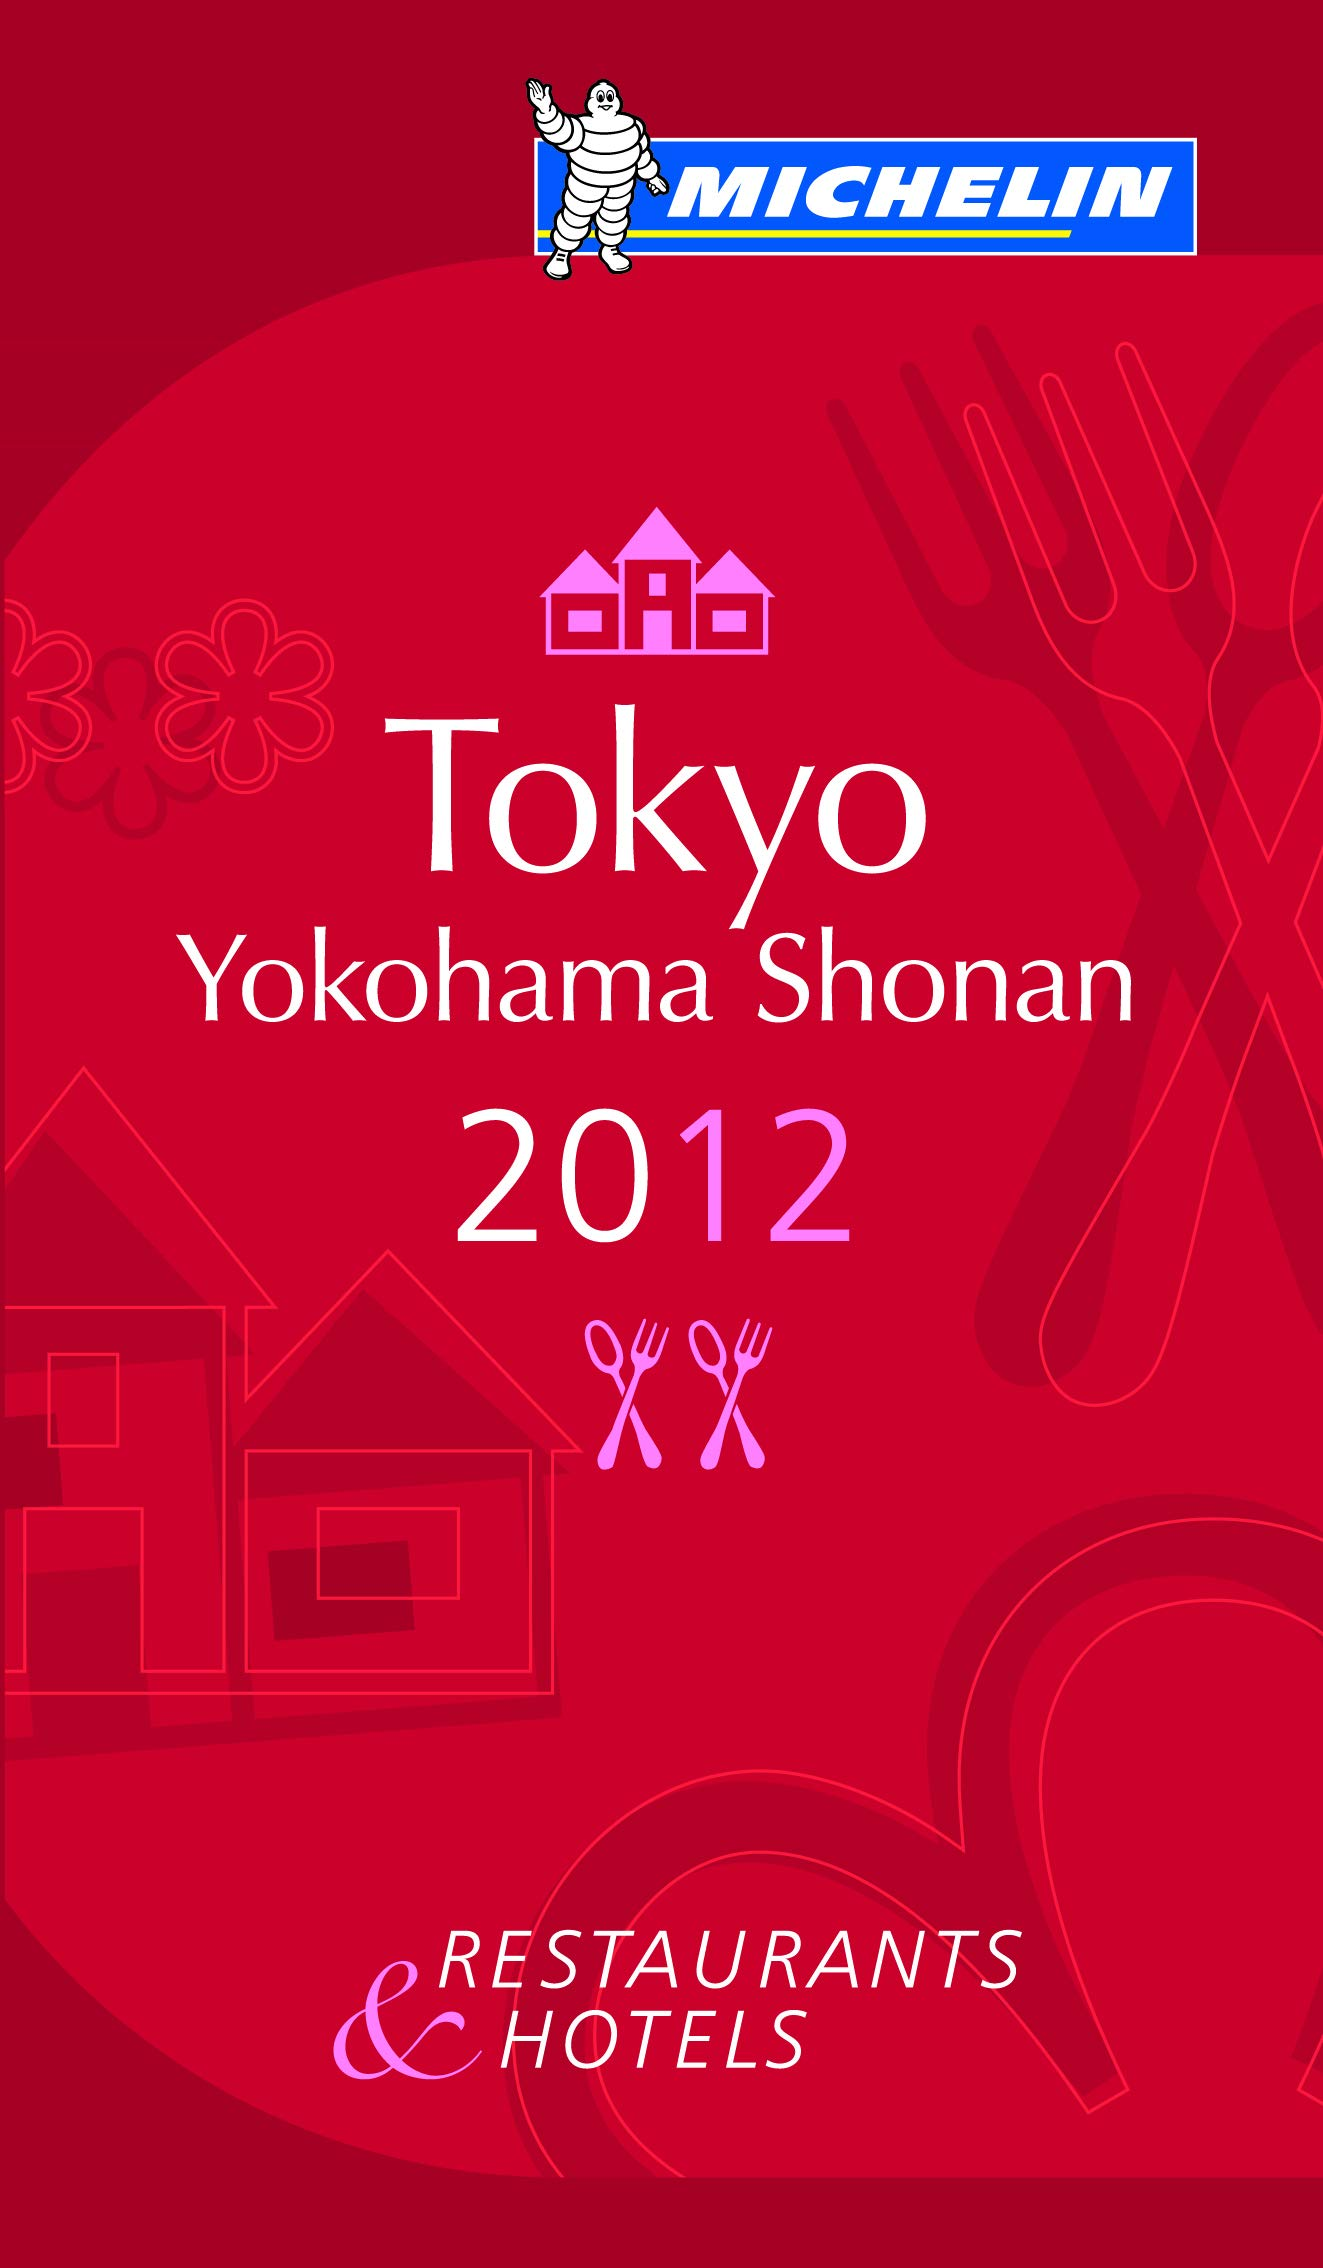 La guía MICHELIN Tokyo Yokohama Kamakura Shonan 2012 La guida Michelin Idioma Inglés: Amazon.es: Michelin Travel & Lifestyle: Libros en idiomas extranjeros